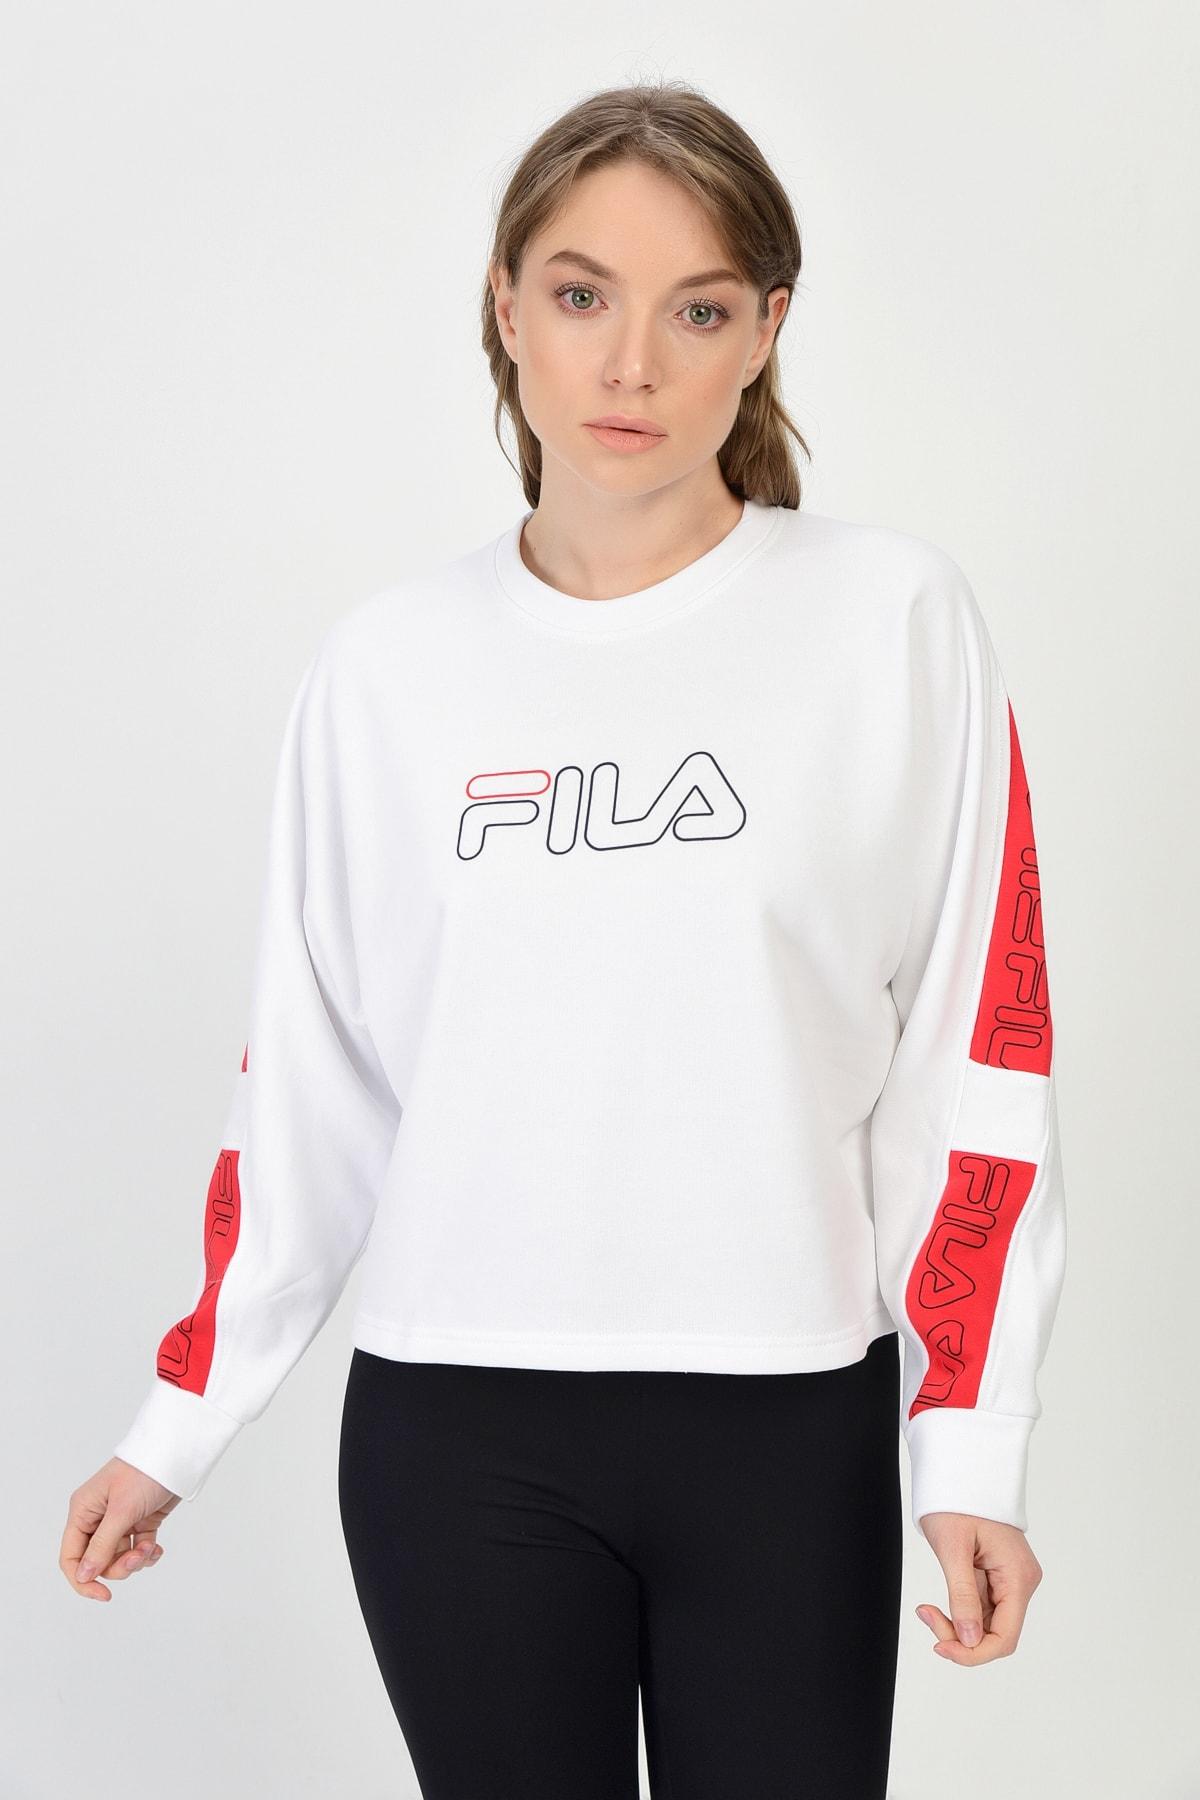 Fila Kadın Spor Sweatshirt - LAURA  - 683070_A138